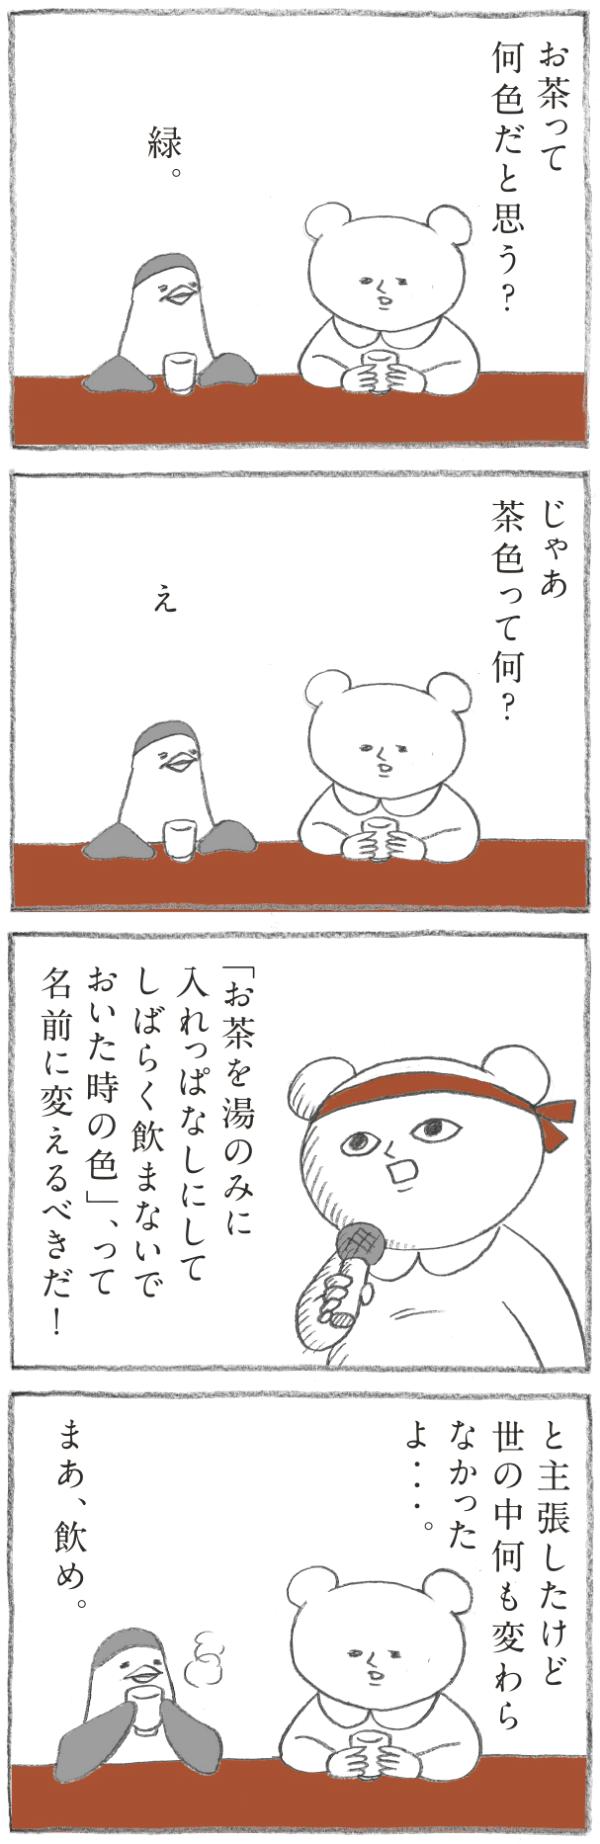 Hanako 1169号:おかわり自由